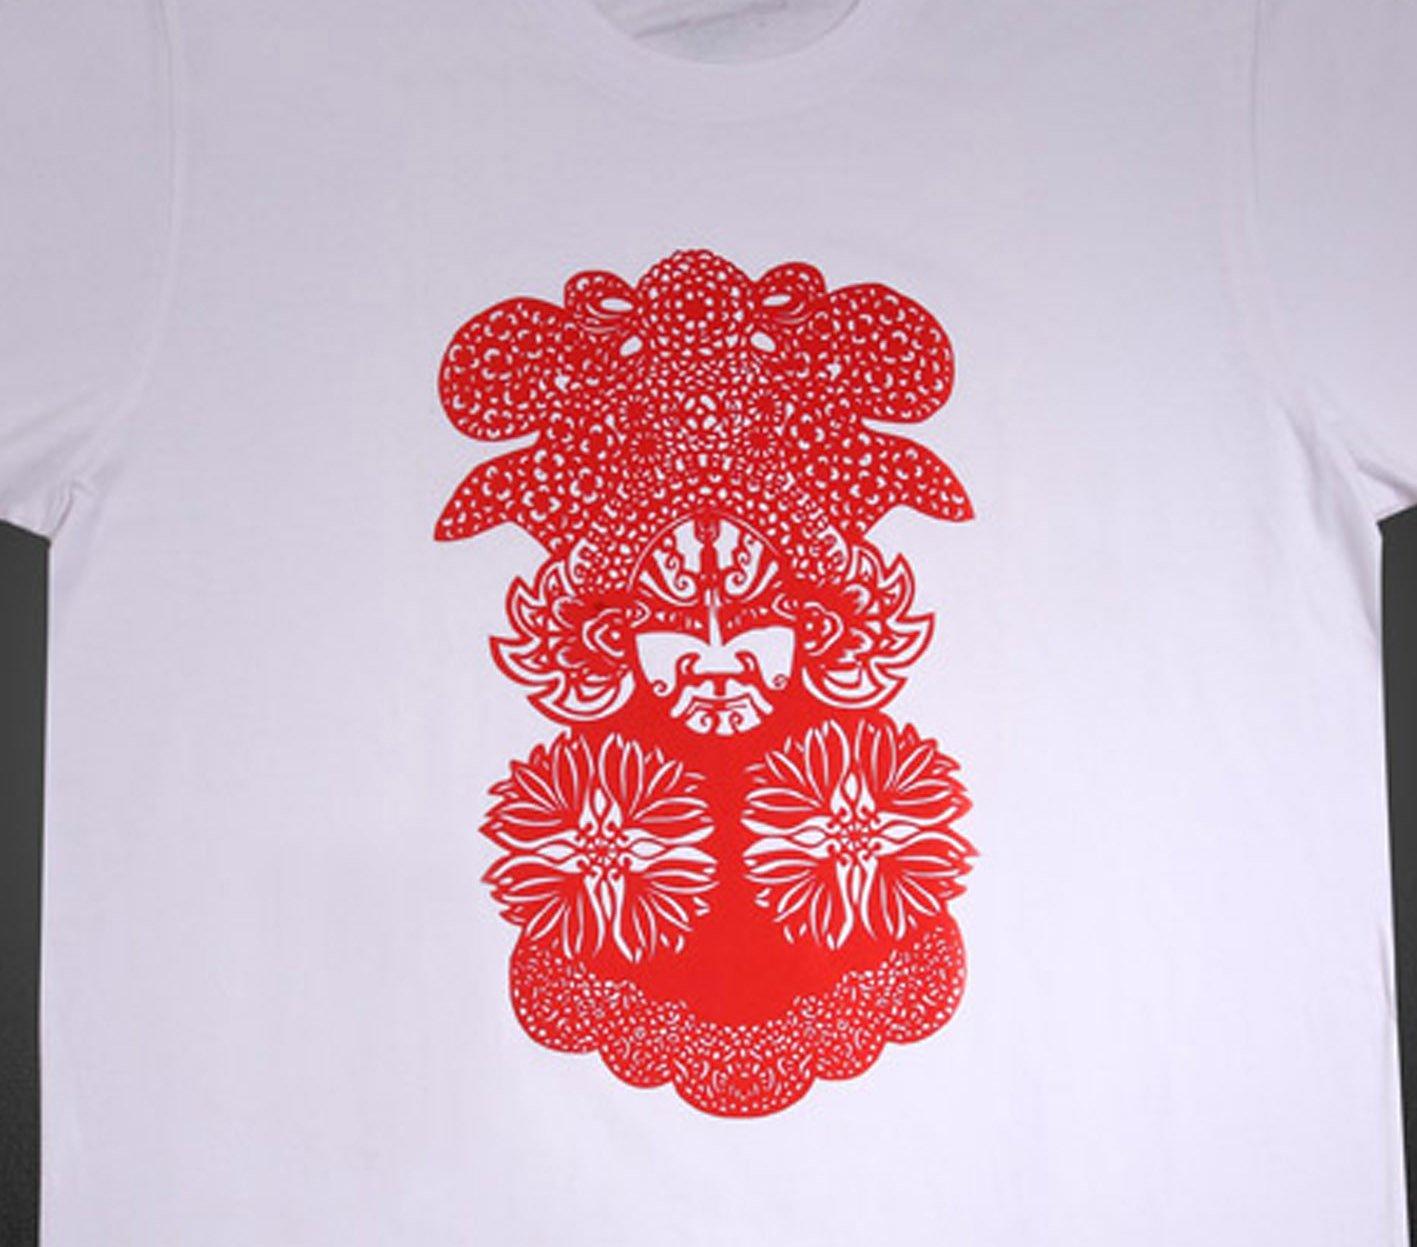 Opera Facial Makeup Graphic T-Shirts for Men, New Tee   (Men's Large)